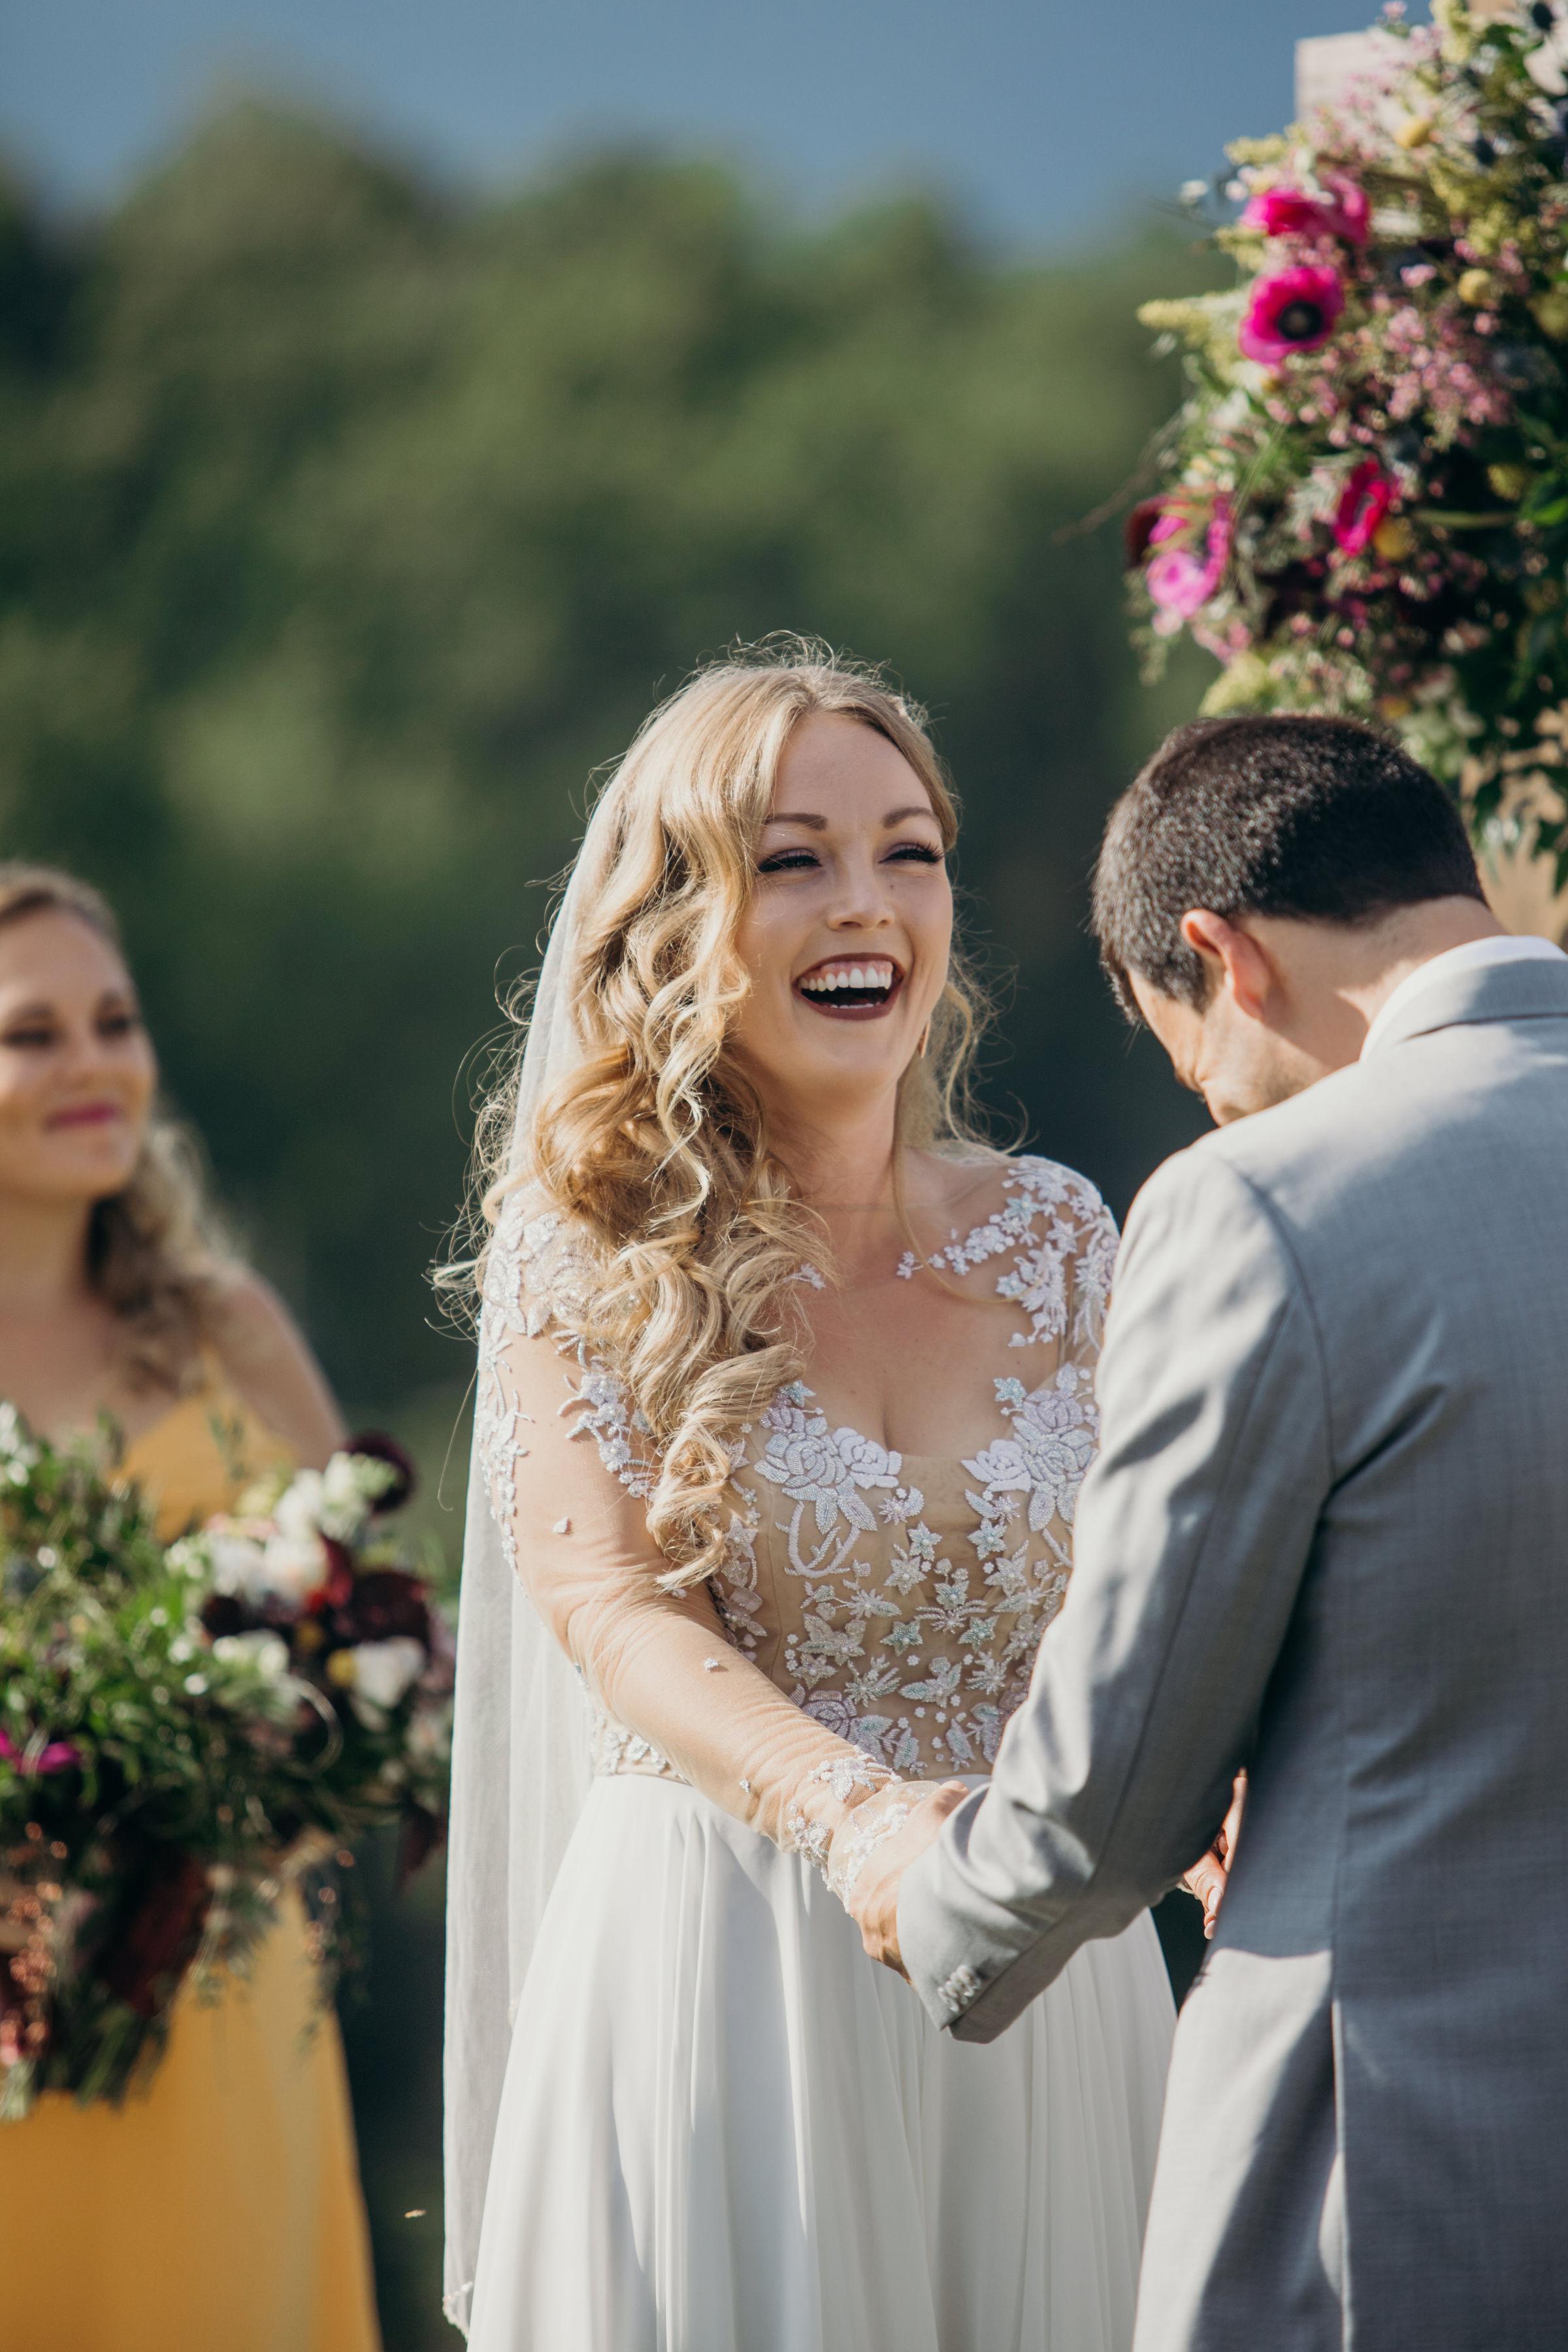 ryan-lauren-wedding-at-montfair-resort-farm-lindsey-paradiso-photography-9126.jpg